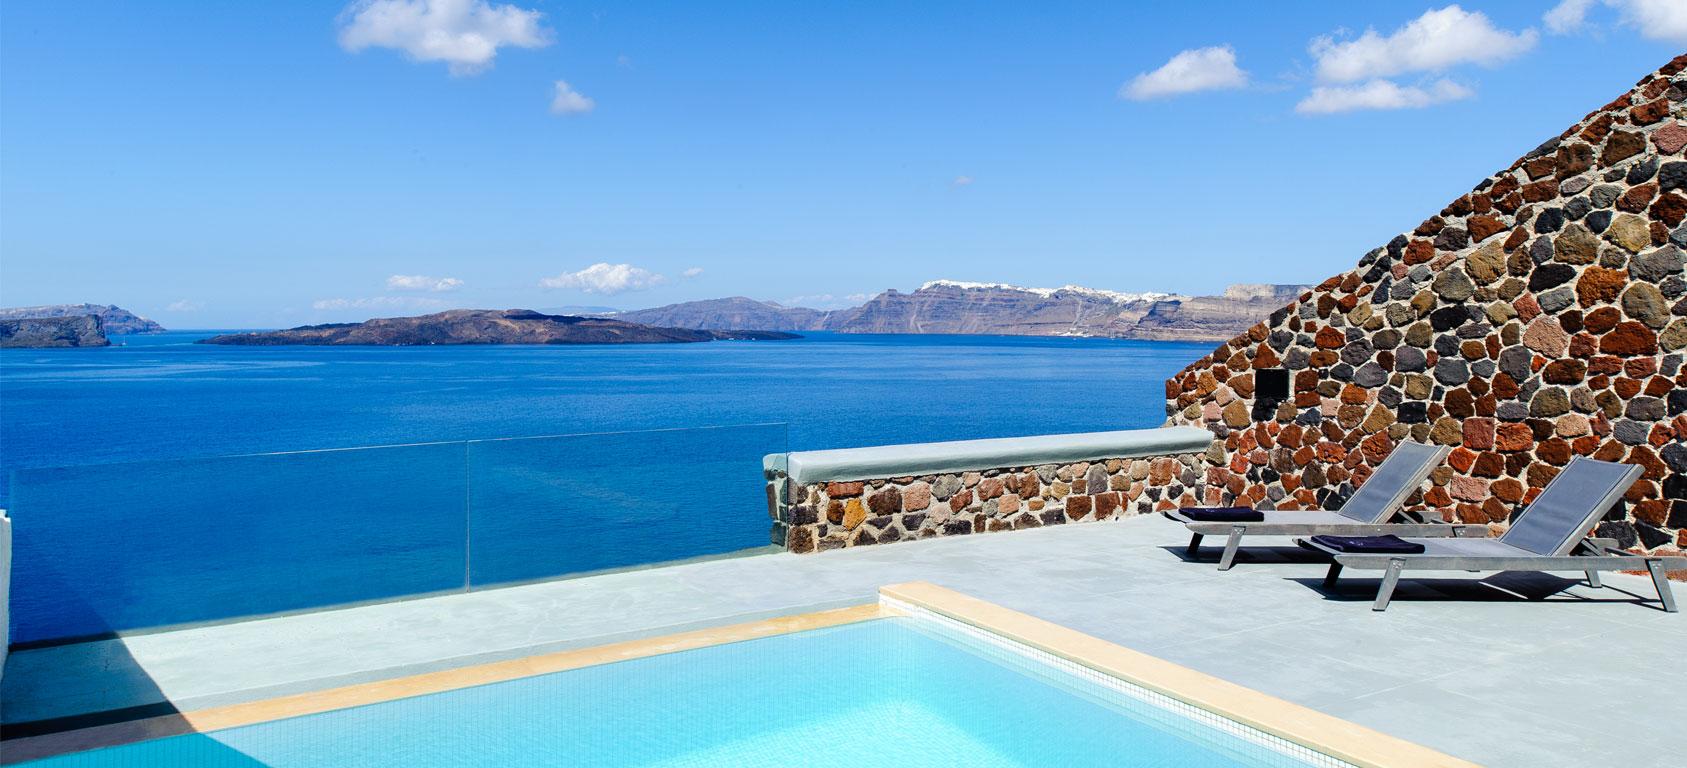 Santorini Hotel Room With Cave Pool